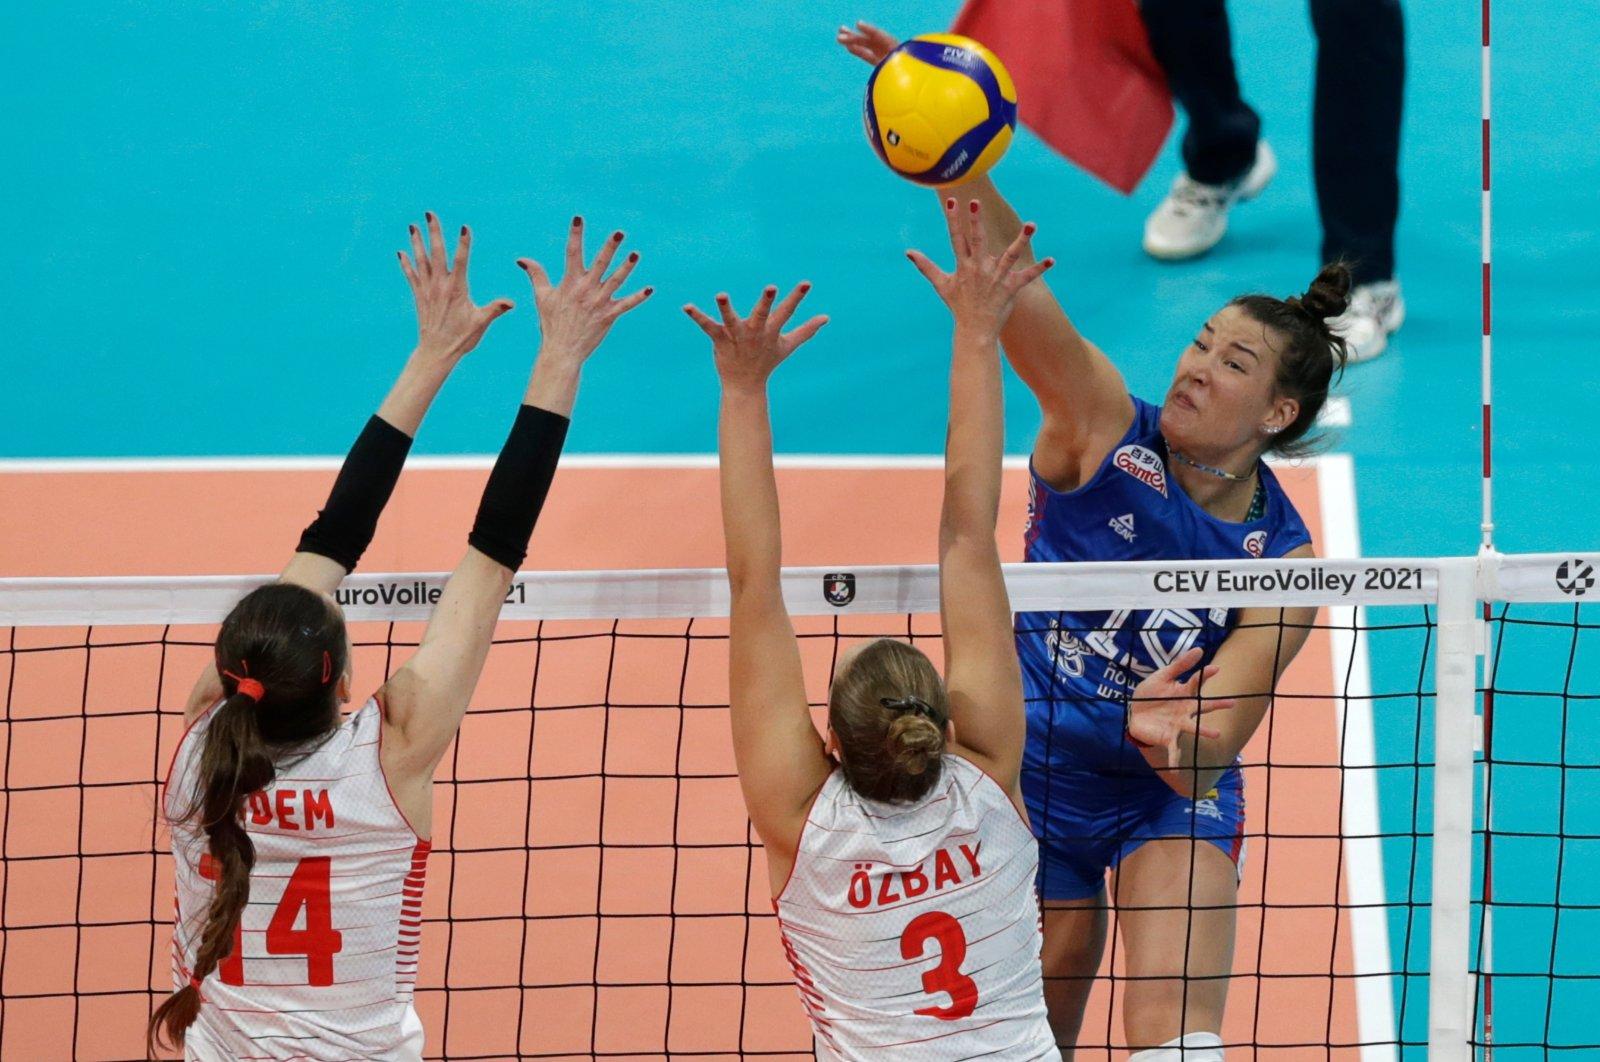 Serbia's Bojana Milenkovic (R) in action against Turkey's Eda Erdem Dündar (L) and Cansu Özbay (C) during the 2021 Women's European Volleyball Championship semifinal match between Turkey and Serbia in Belgrade, Serbia, Sept. 3, 2021. (EPA Photo)